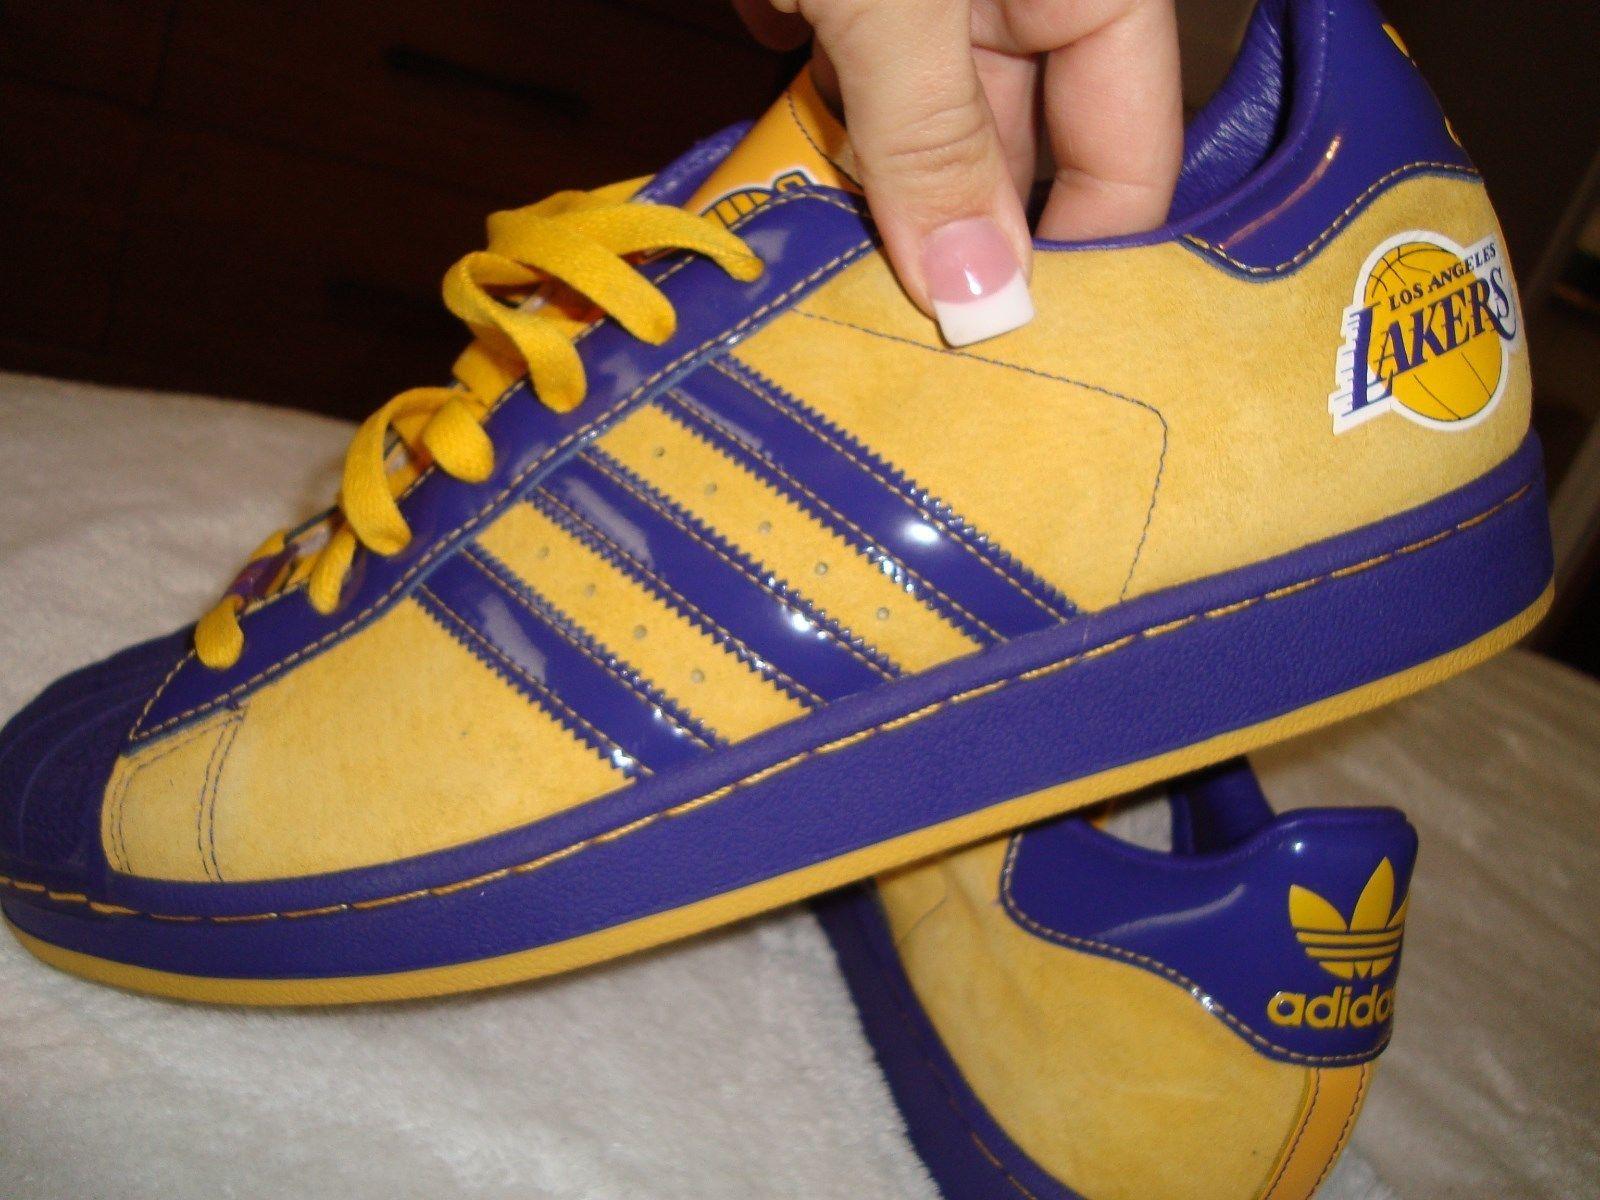 Los angeles lakers, Adidas men, Adidas